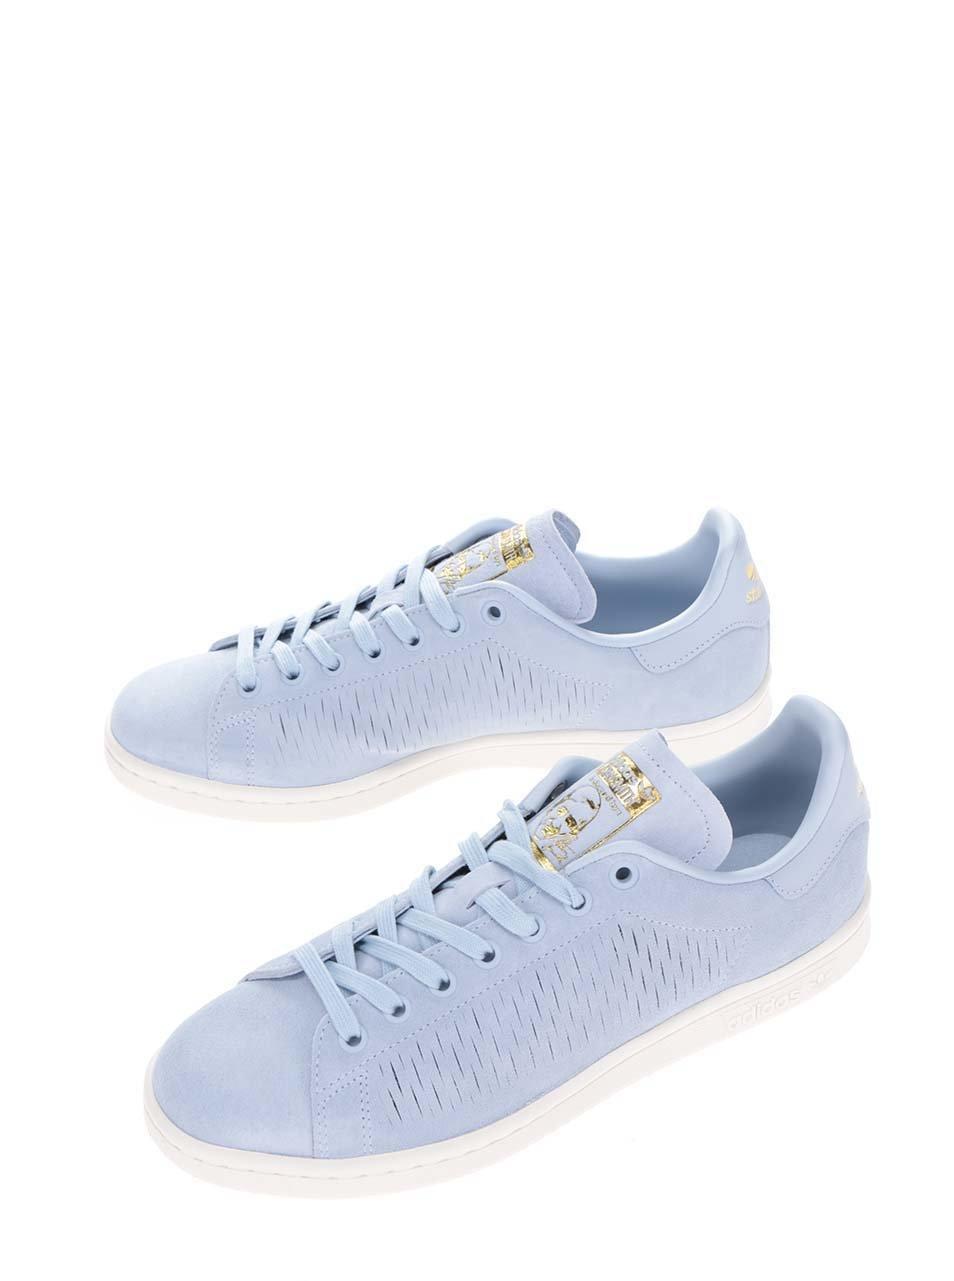 d05701a5f28 Světle modré dámské tenisky adidas Originals Stan Smith - eleganter.cz